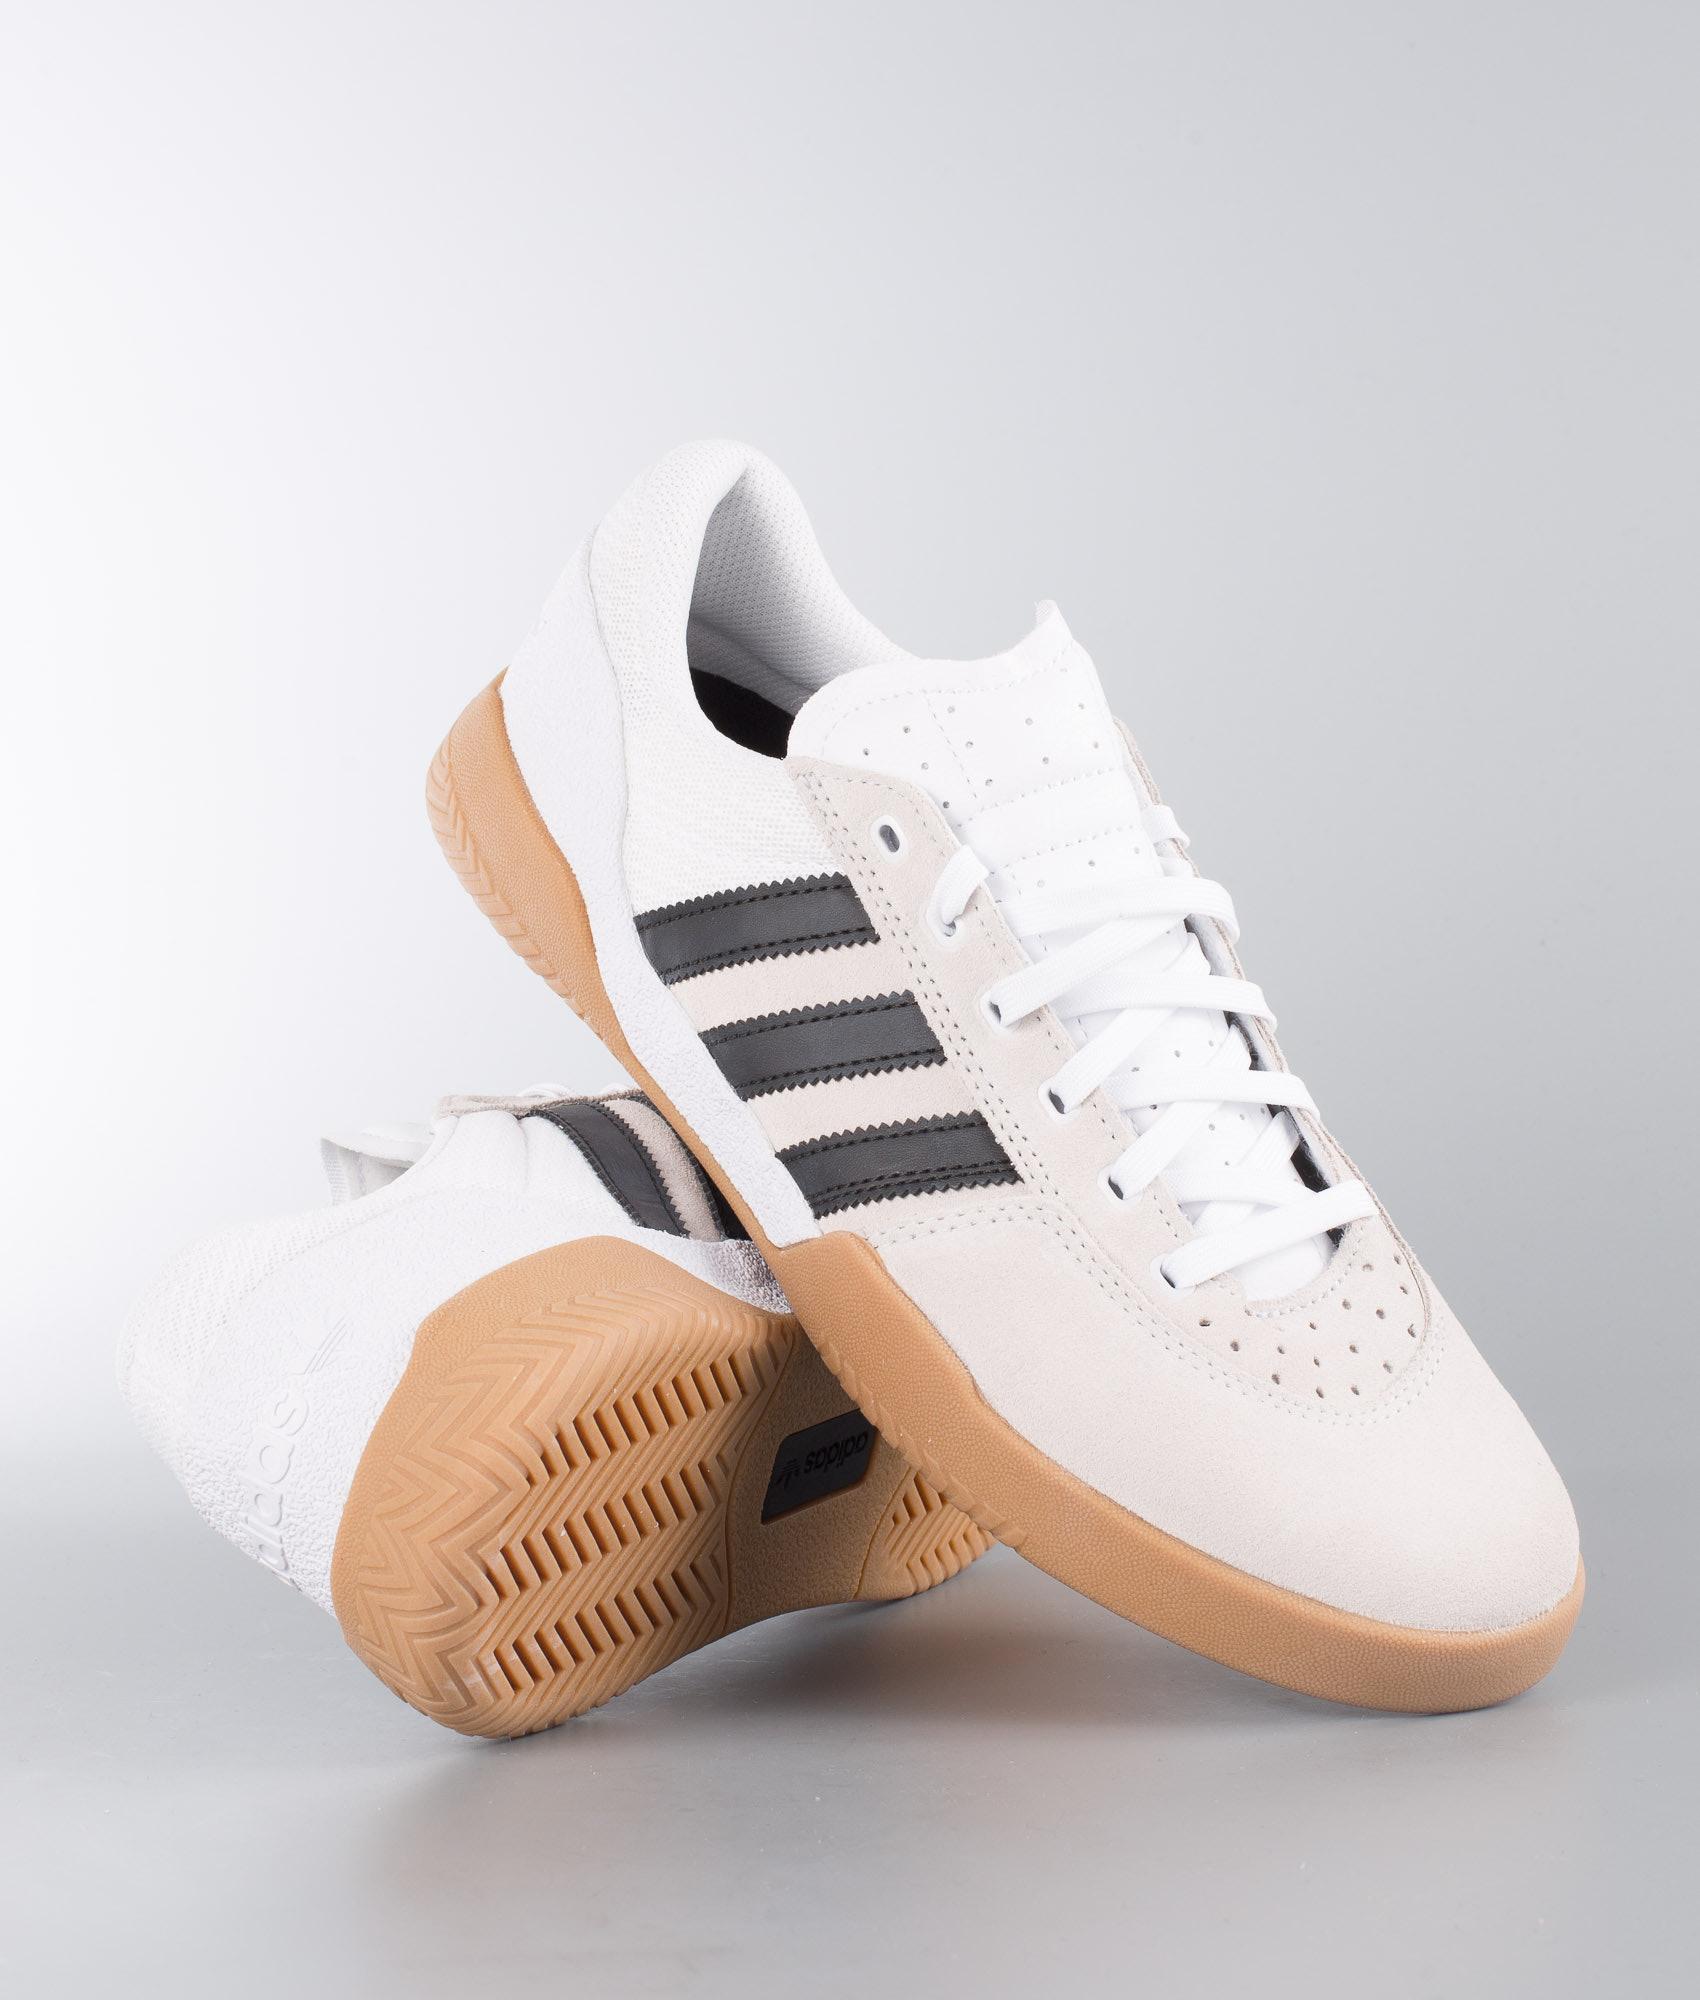 dcbd9551dcb Adidas Skateboarding City Cup Shoes Footwear White Core Black Gum ...